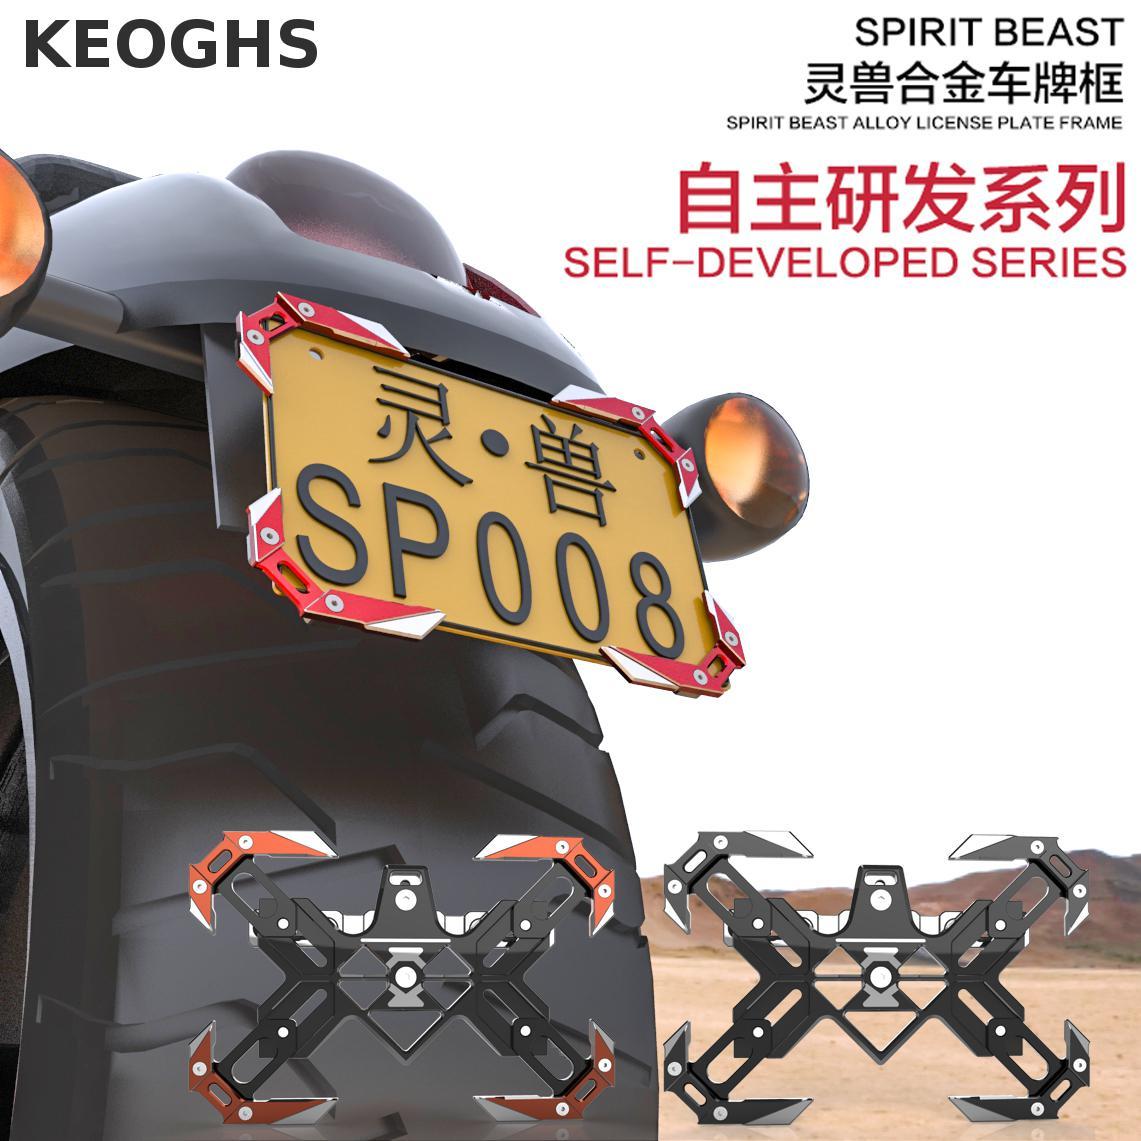 Keoghs Motorcycle Creative Cnc License Plate Frame High Quality Adjustable Universal For Honda Kawasaki Yamaha Suzuki Ktm Bmw